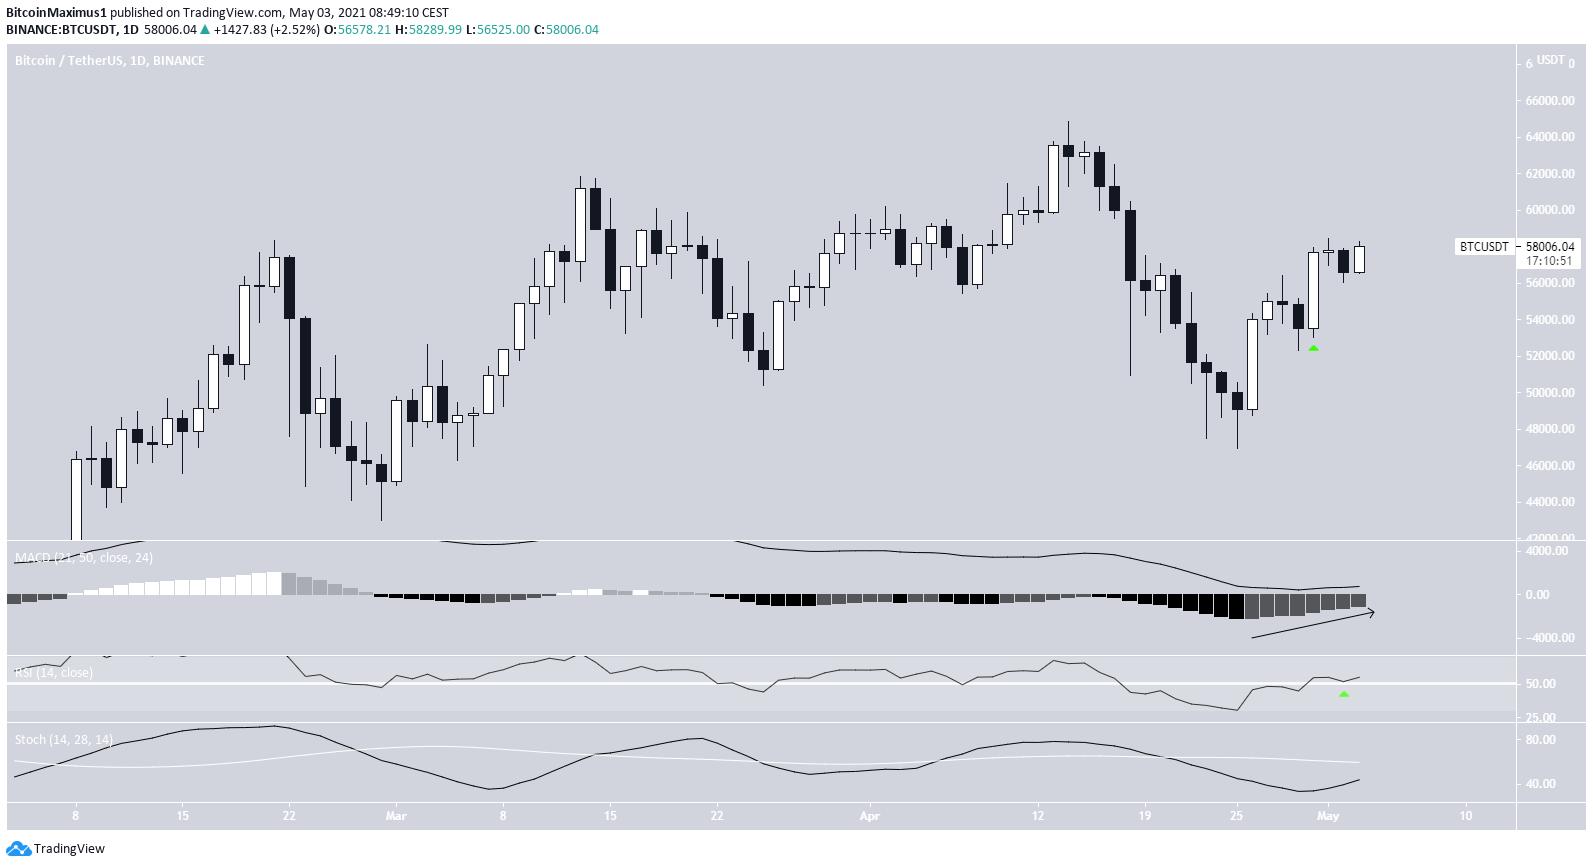 Bitcoin Chart Preis Kurs Daily 03.05.2021